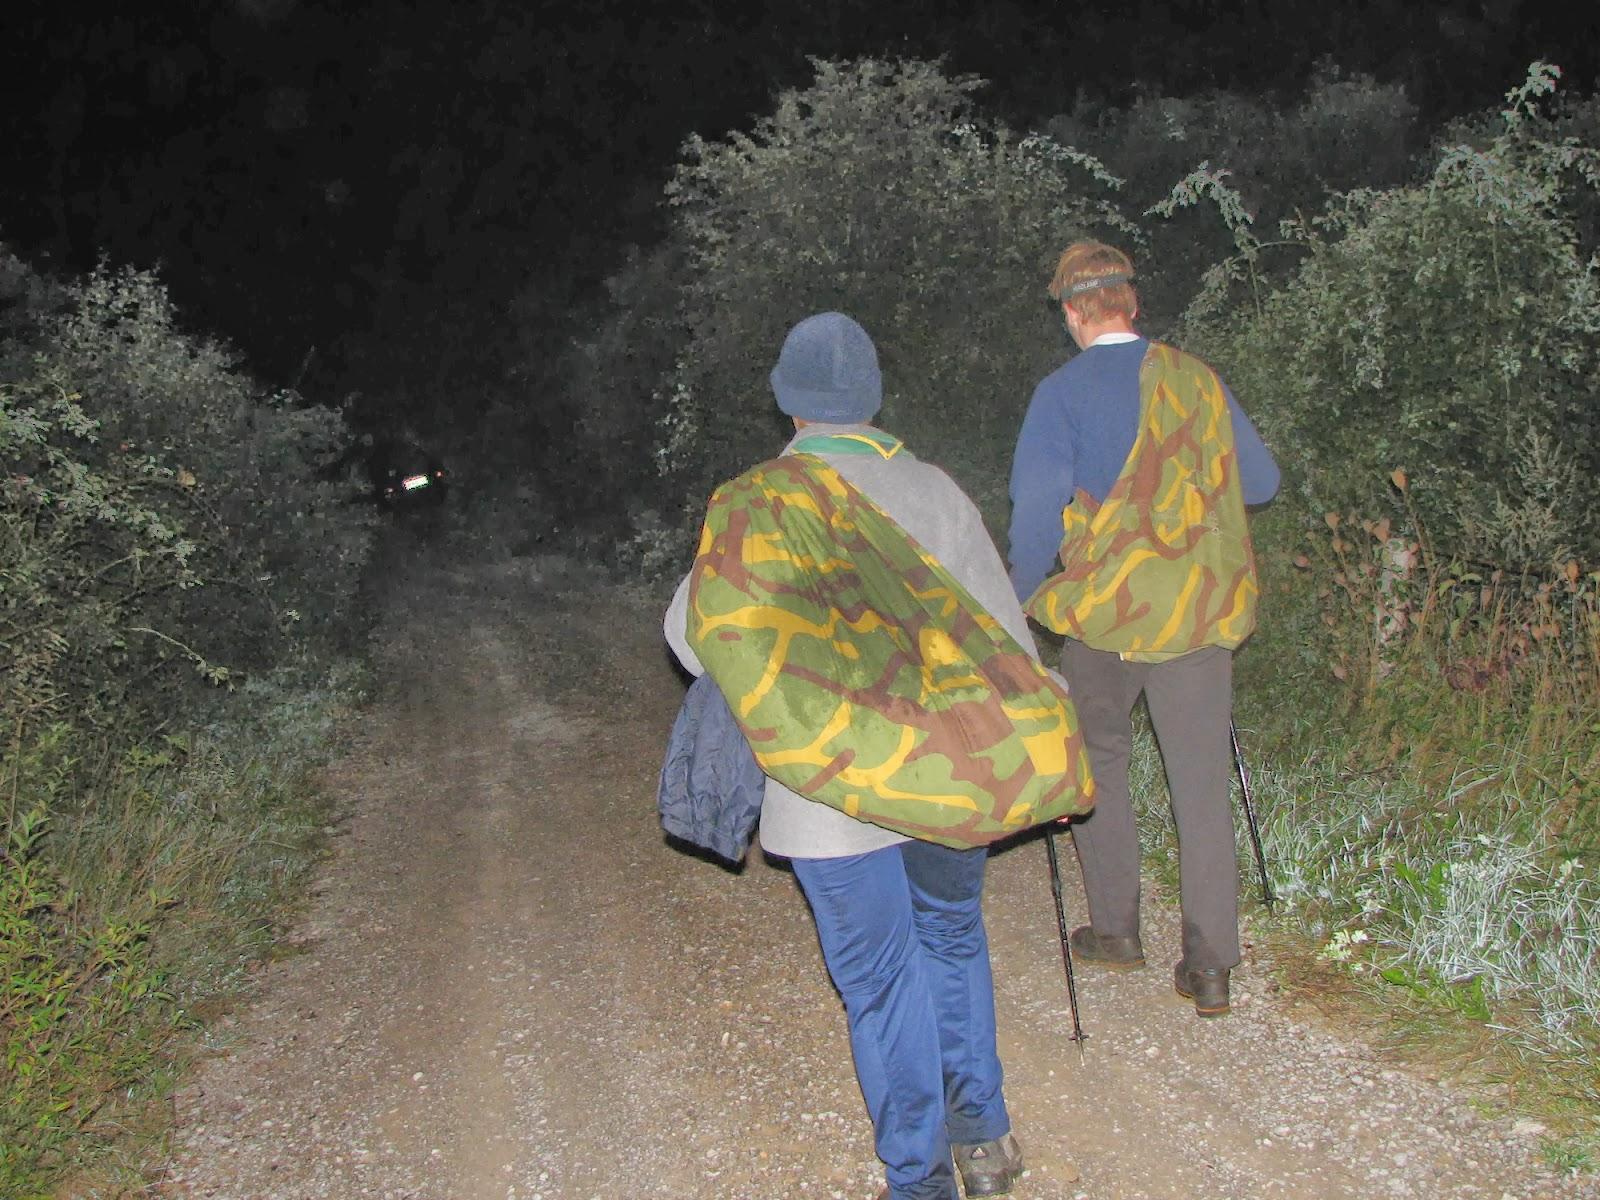 Prehod PP, Ilirska Bistrica 2005 - picture%2B053.jpg